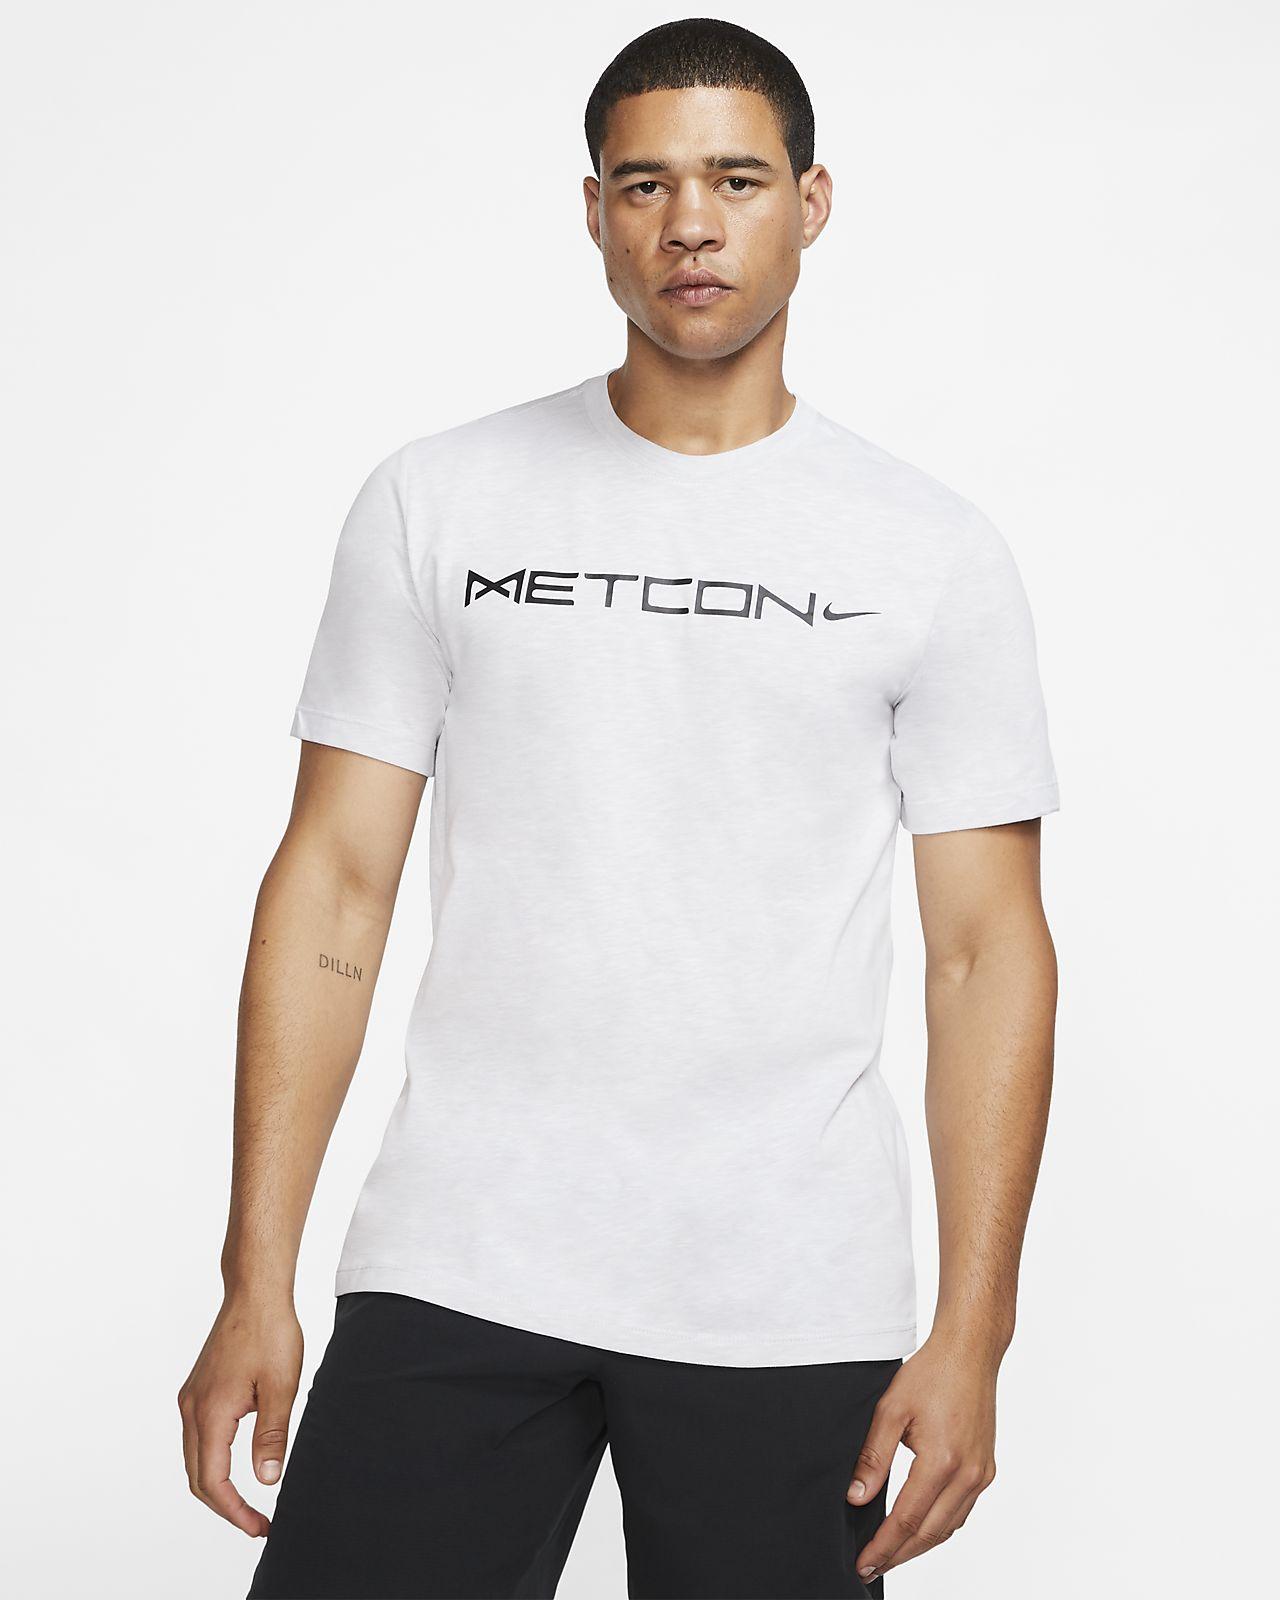 Tee-shirt de training Nike Dri-FIT « Metcon » pour Homme